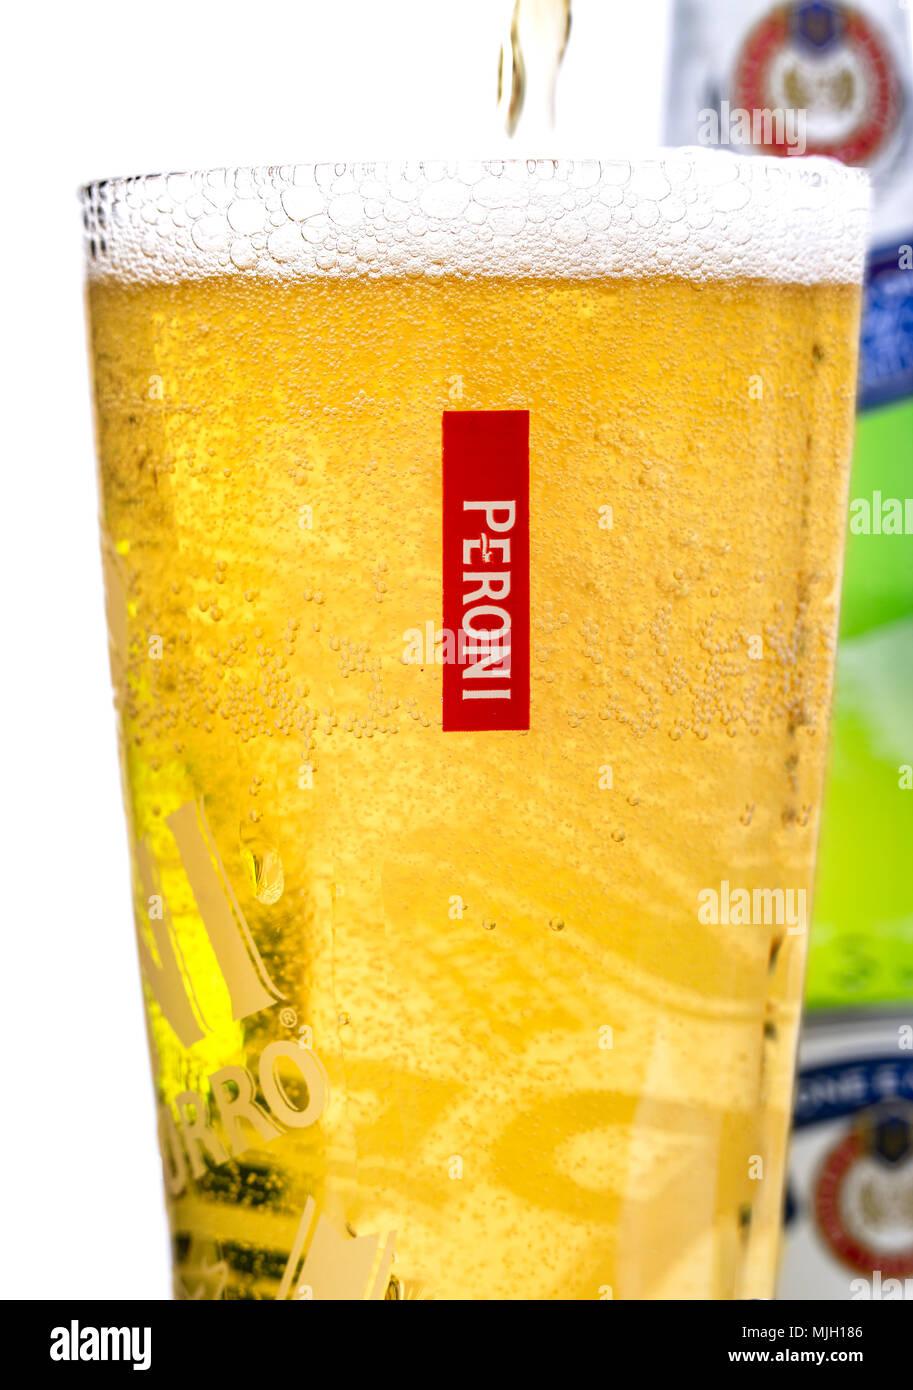 SWINDON, Großbritannien - 5. Mai 2018: Peroni Bier, Brauerei Peroni (Birra Peroni), ist ein Brewing Company, in Italien gegründet. Stockbild